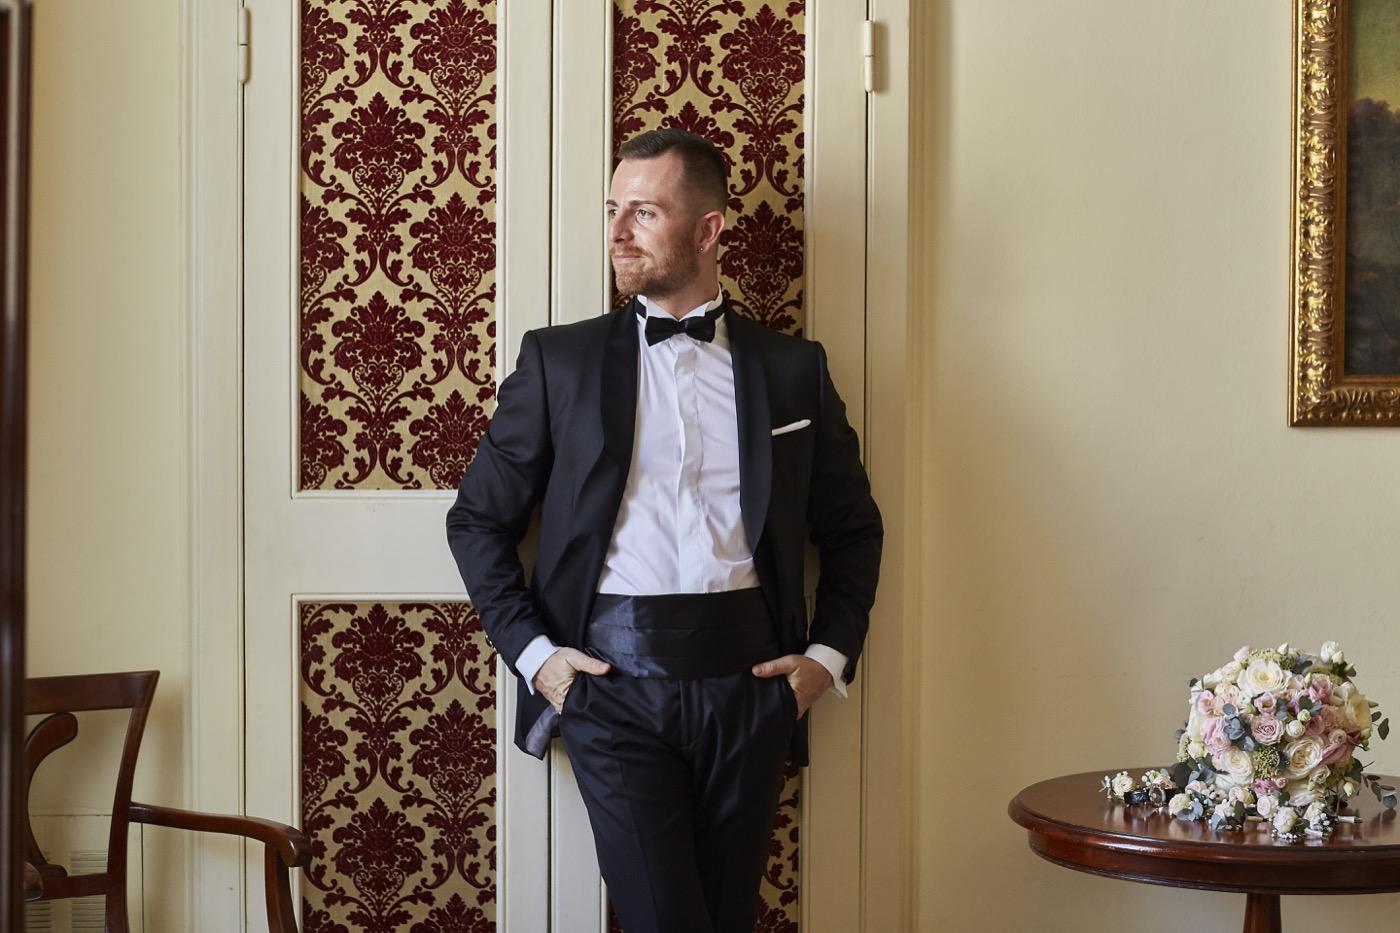 Claudio-Coppola-wedding-photographer-la-scuderia-eventi-preparativi-la-rosetta-perugia-9